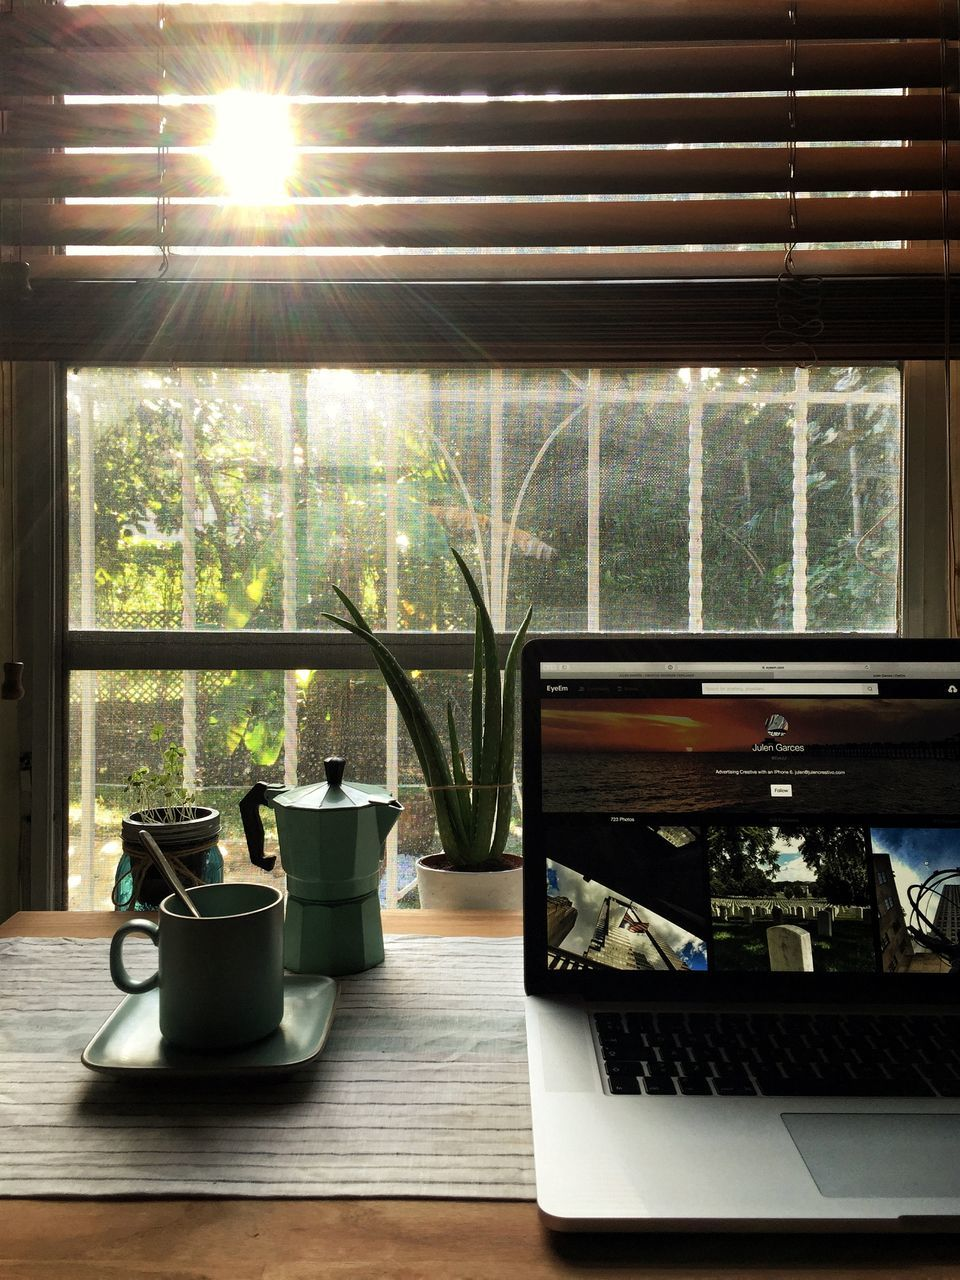 window, indoors, sunlight, no people, day, greenhouse, nature, tree